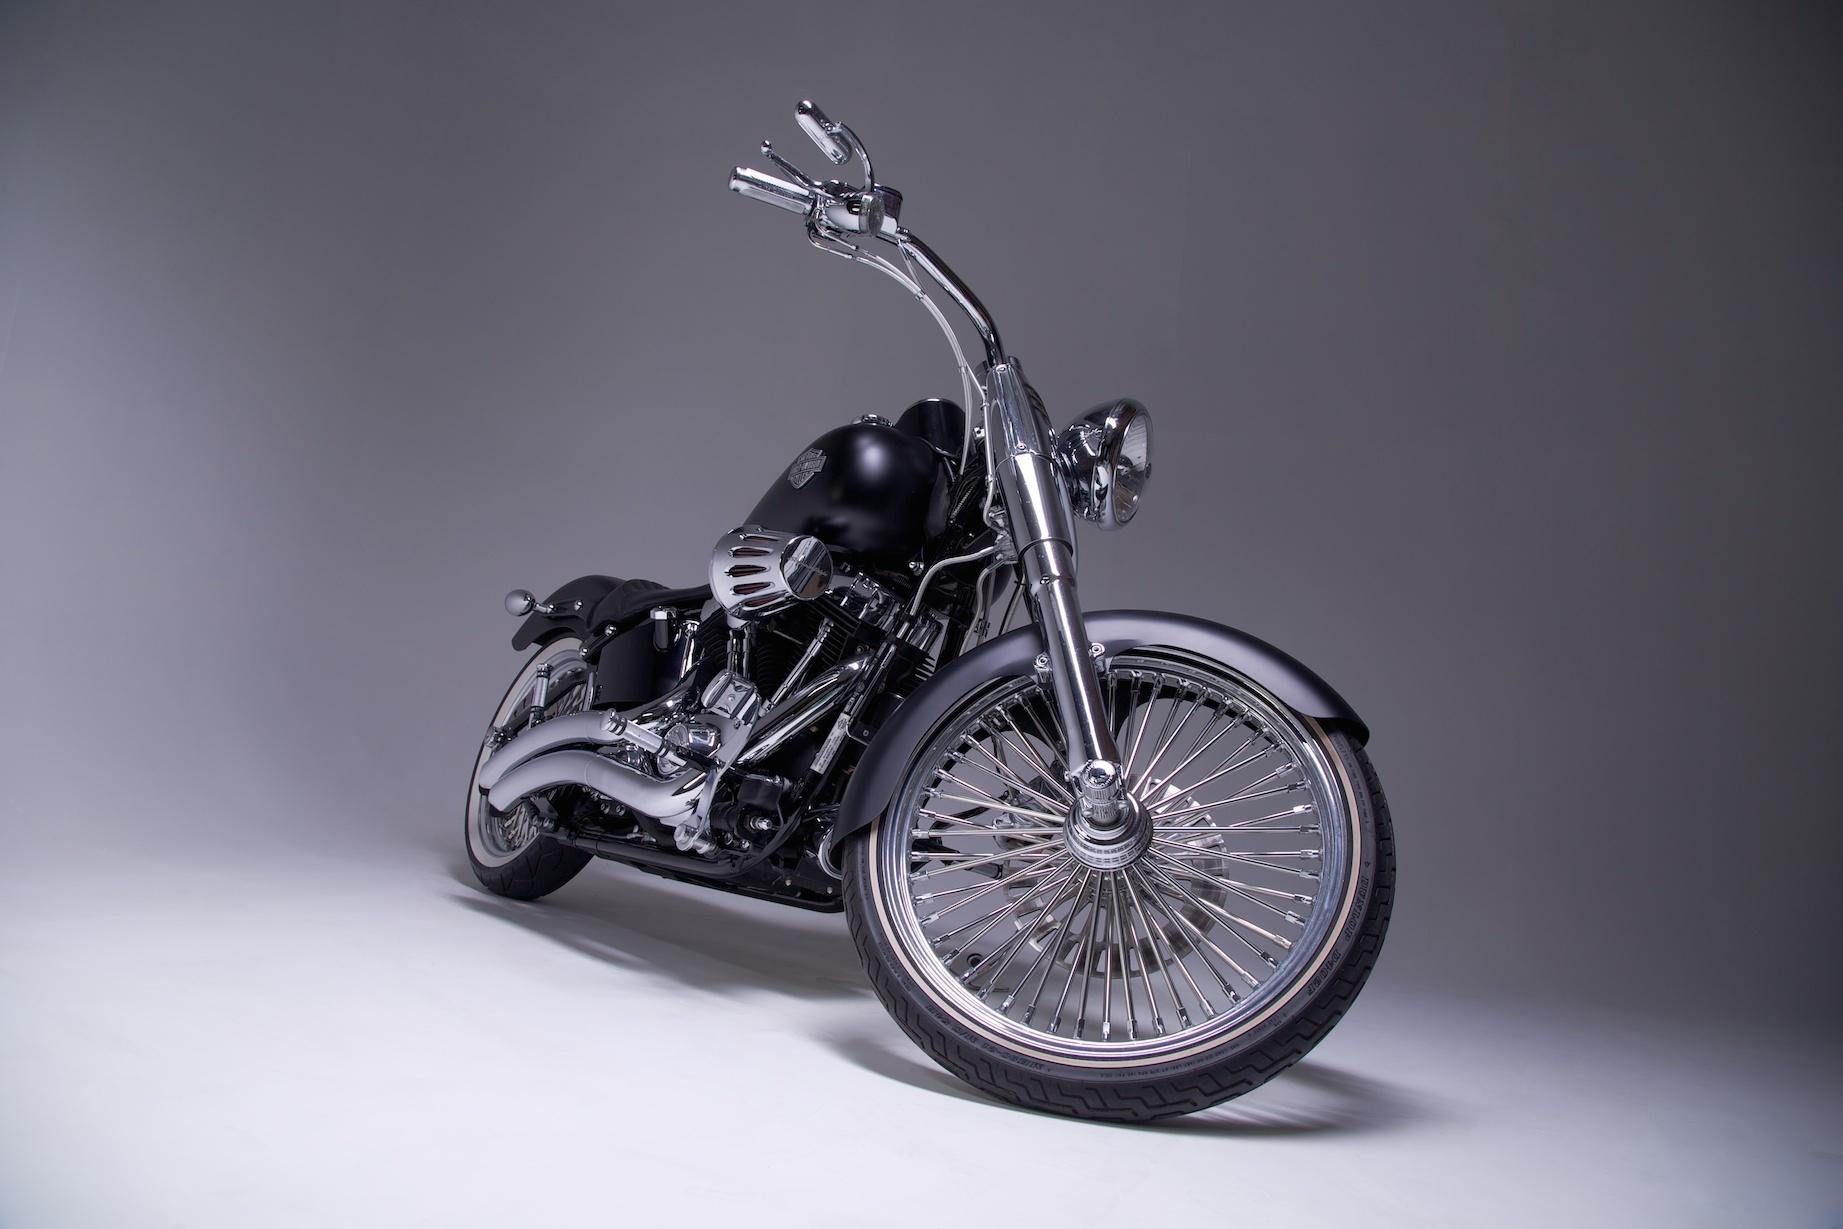 Professional Harley Davidson Photographer, Quality Photography Studio Gold Coast